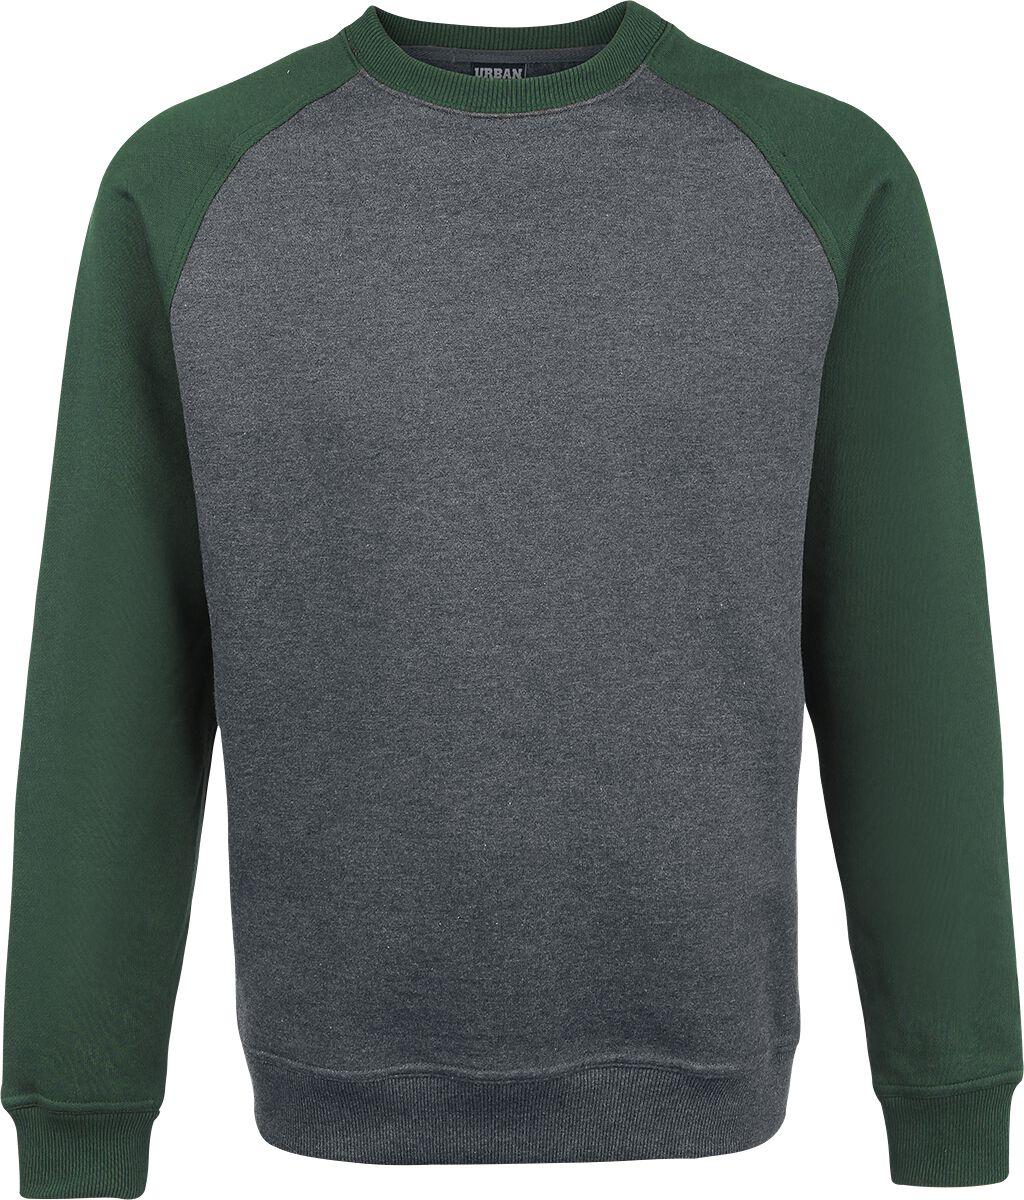 Image of   Urban Classics 2-Tone Raglan Crewneck Sweatshirt koks-grøn